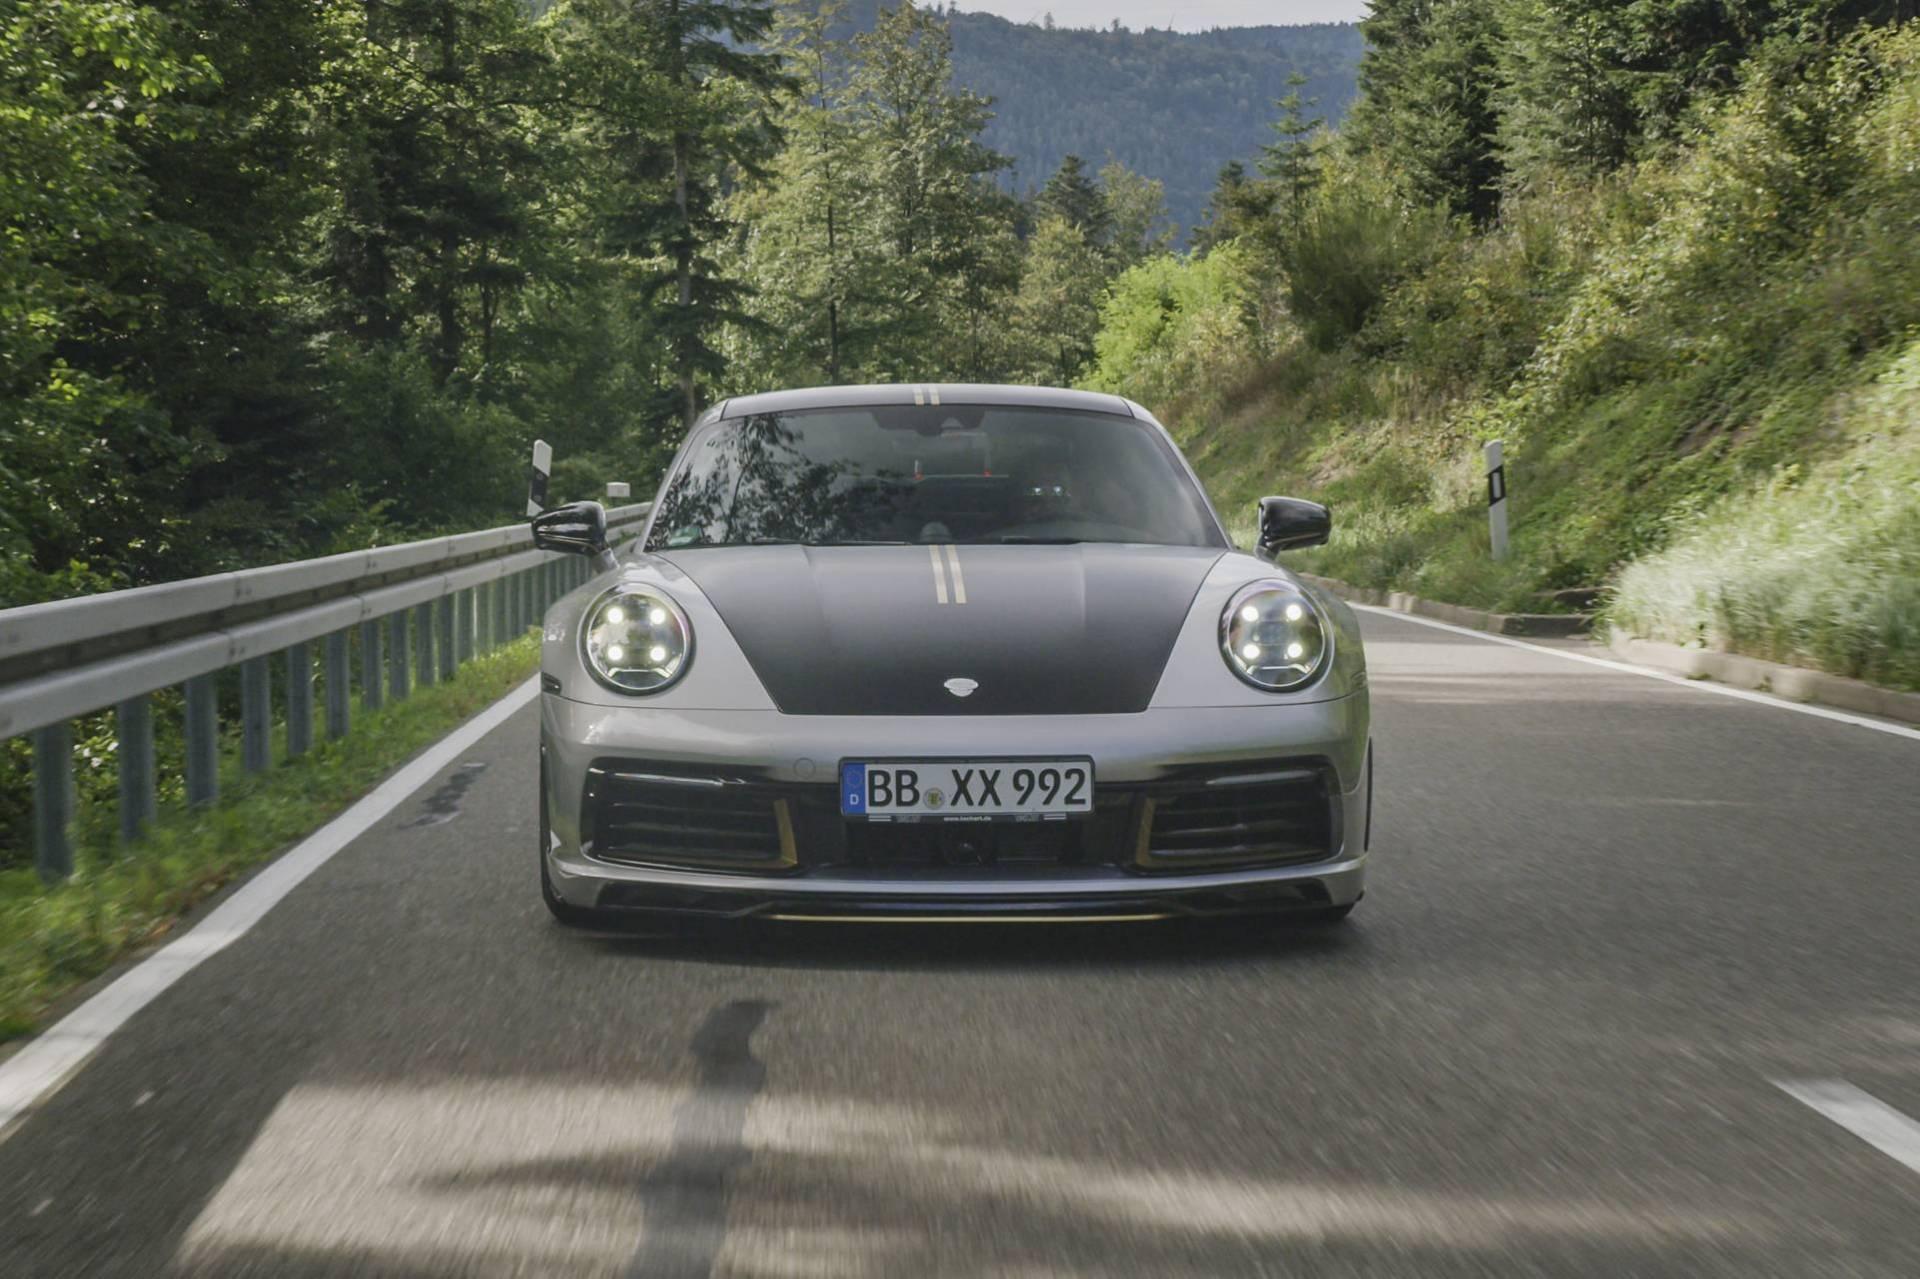 Chi tiet Porsche 911 2020 lot xac man nhan voi goi do thu cong hinh anh 50